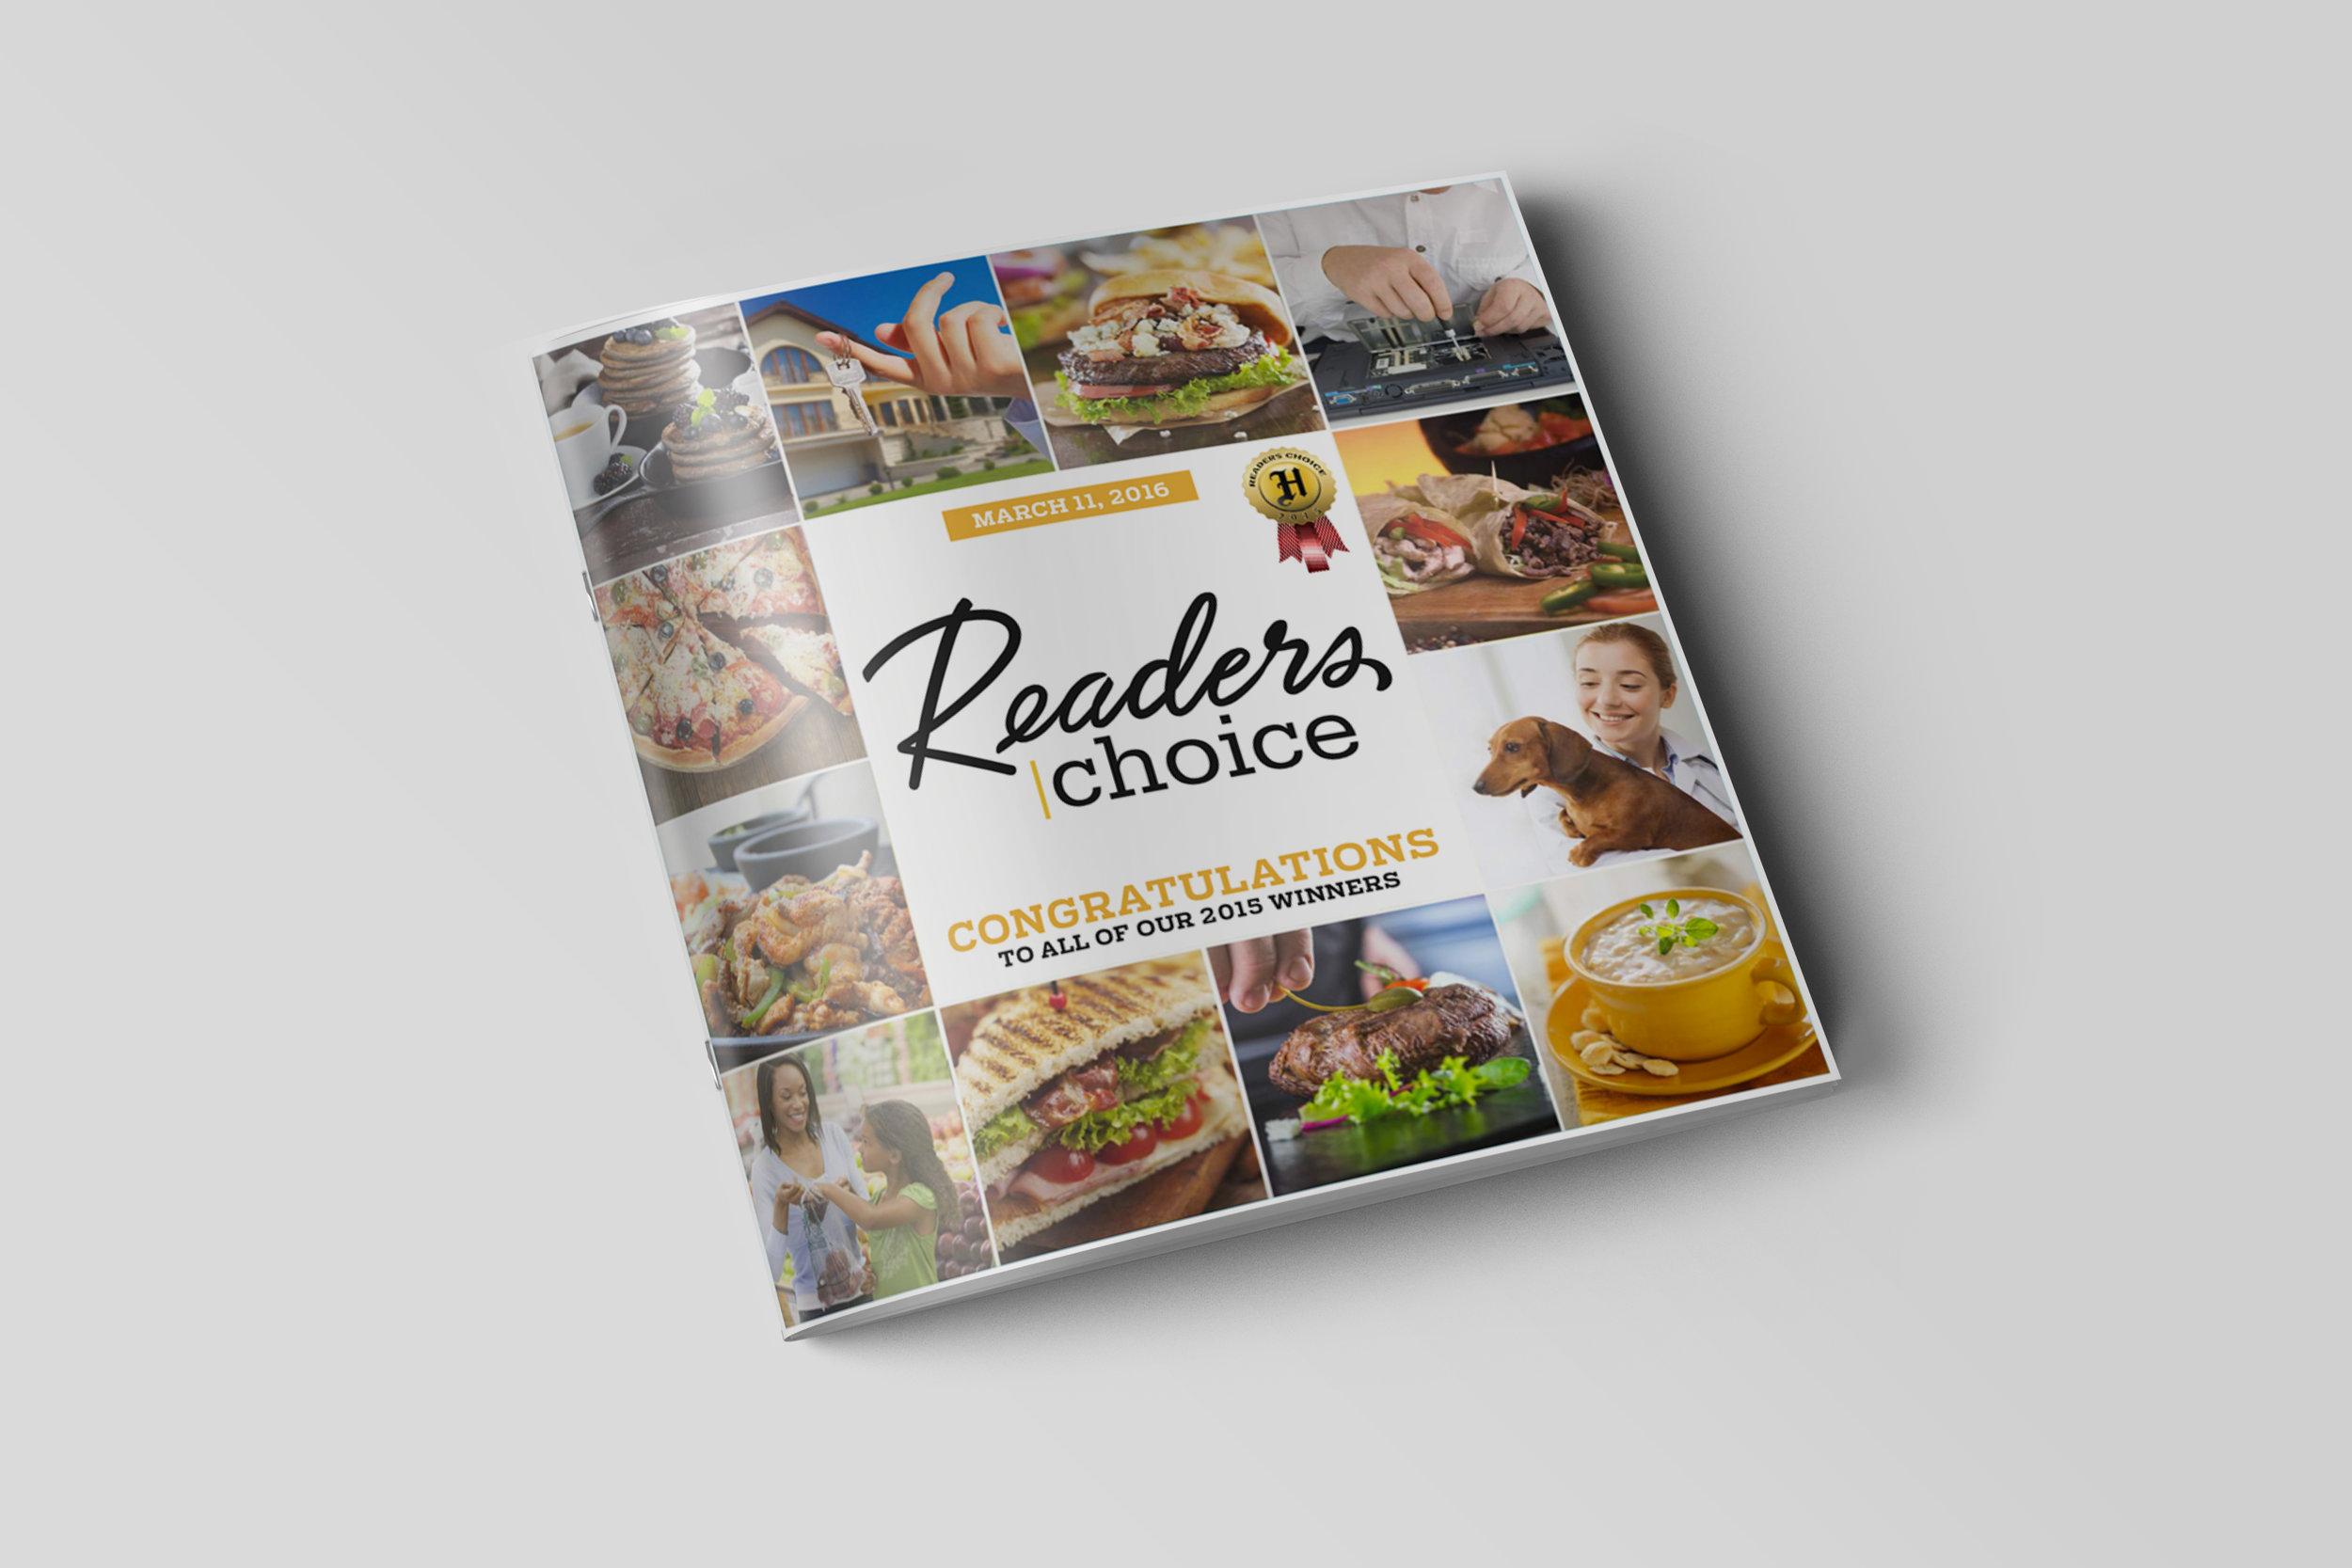 Readers' Choice 2016